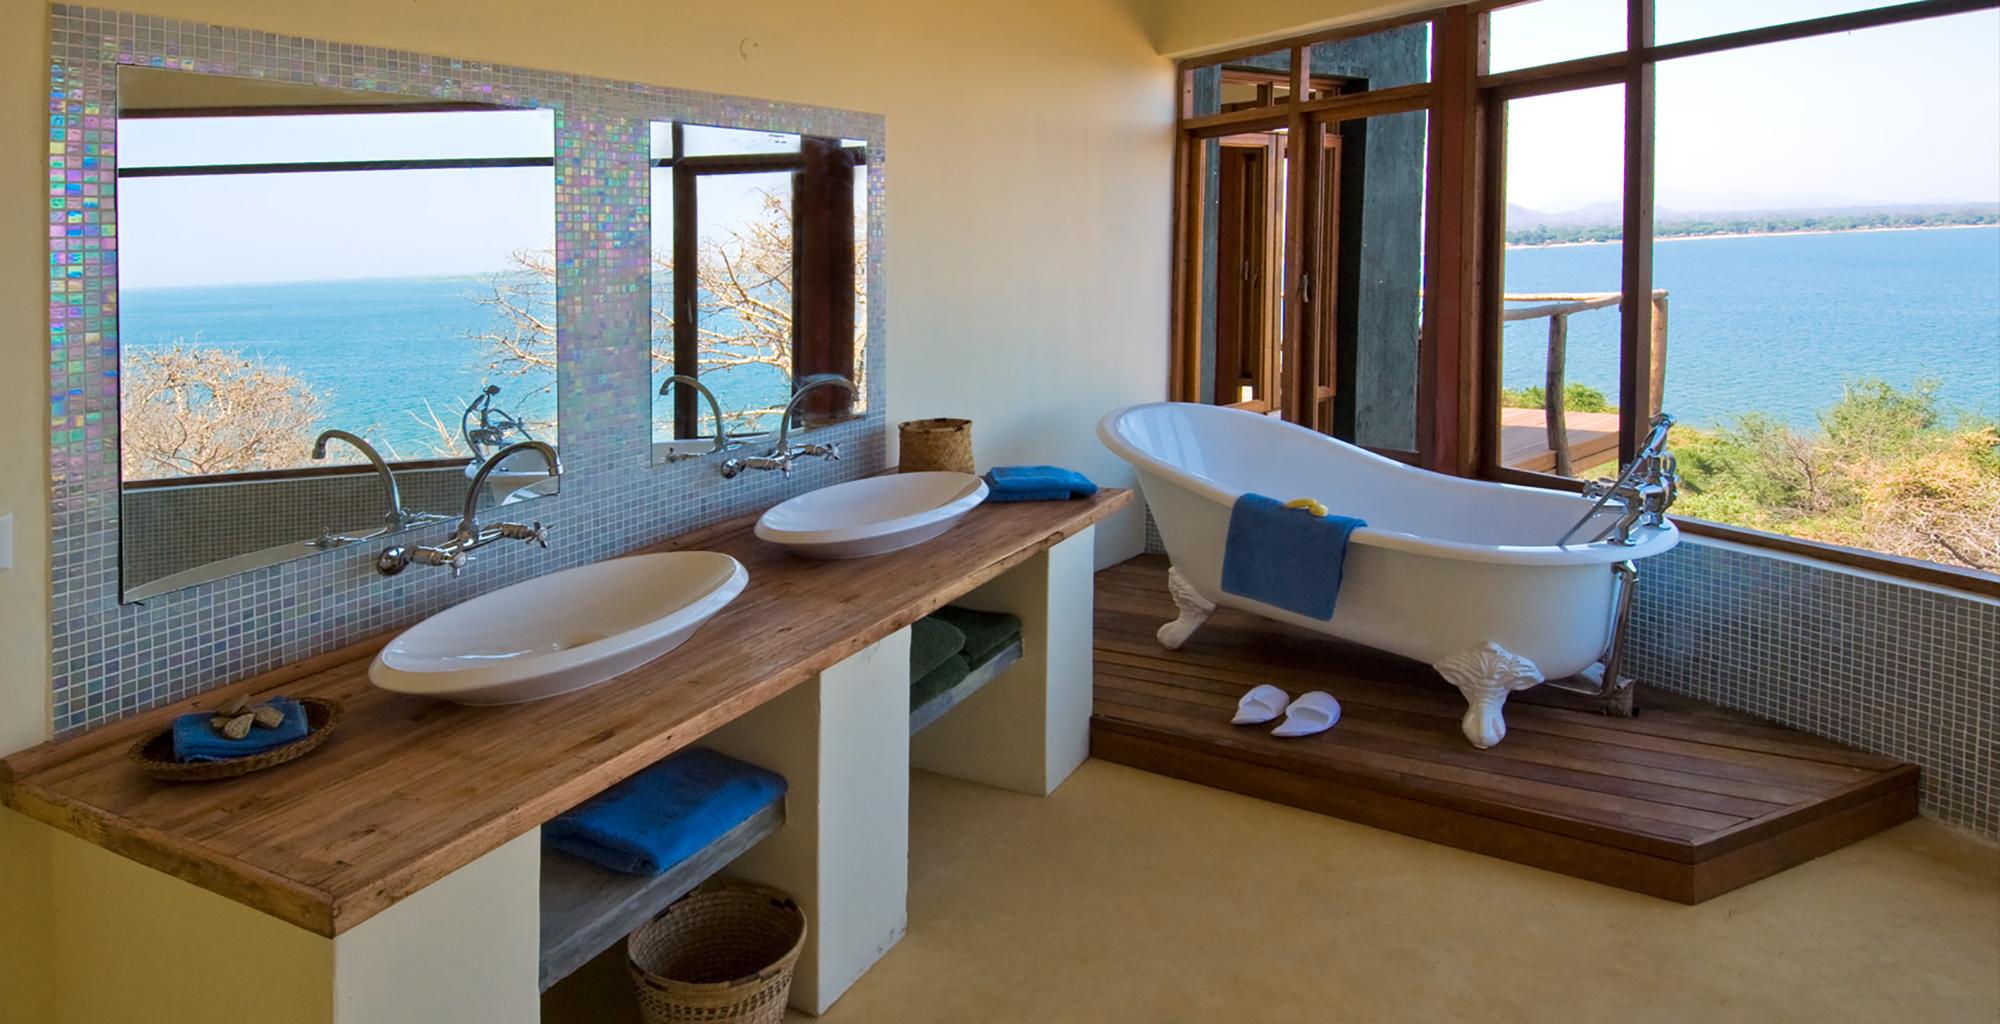 Lake-Malawi-Pumulani-Beach-Lodge-Bathroom